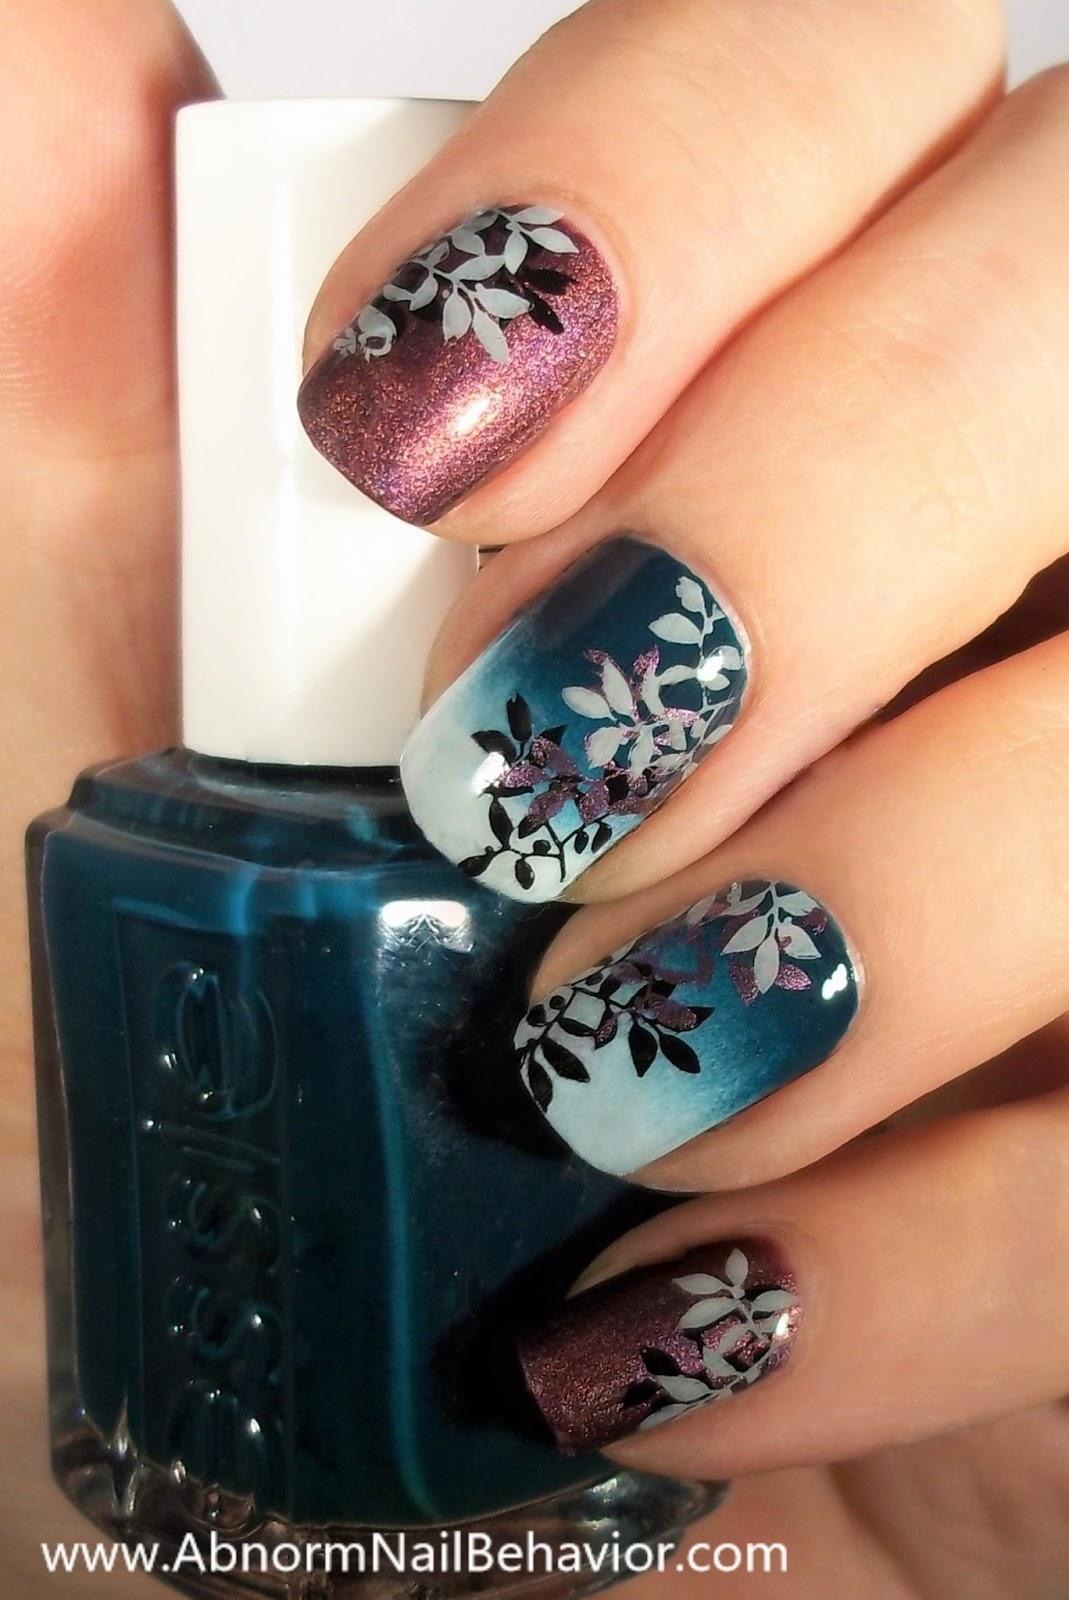 Nail Art : Elegant Nails: Misty Garden